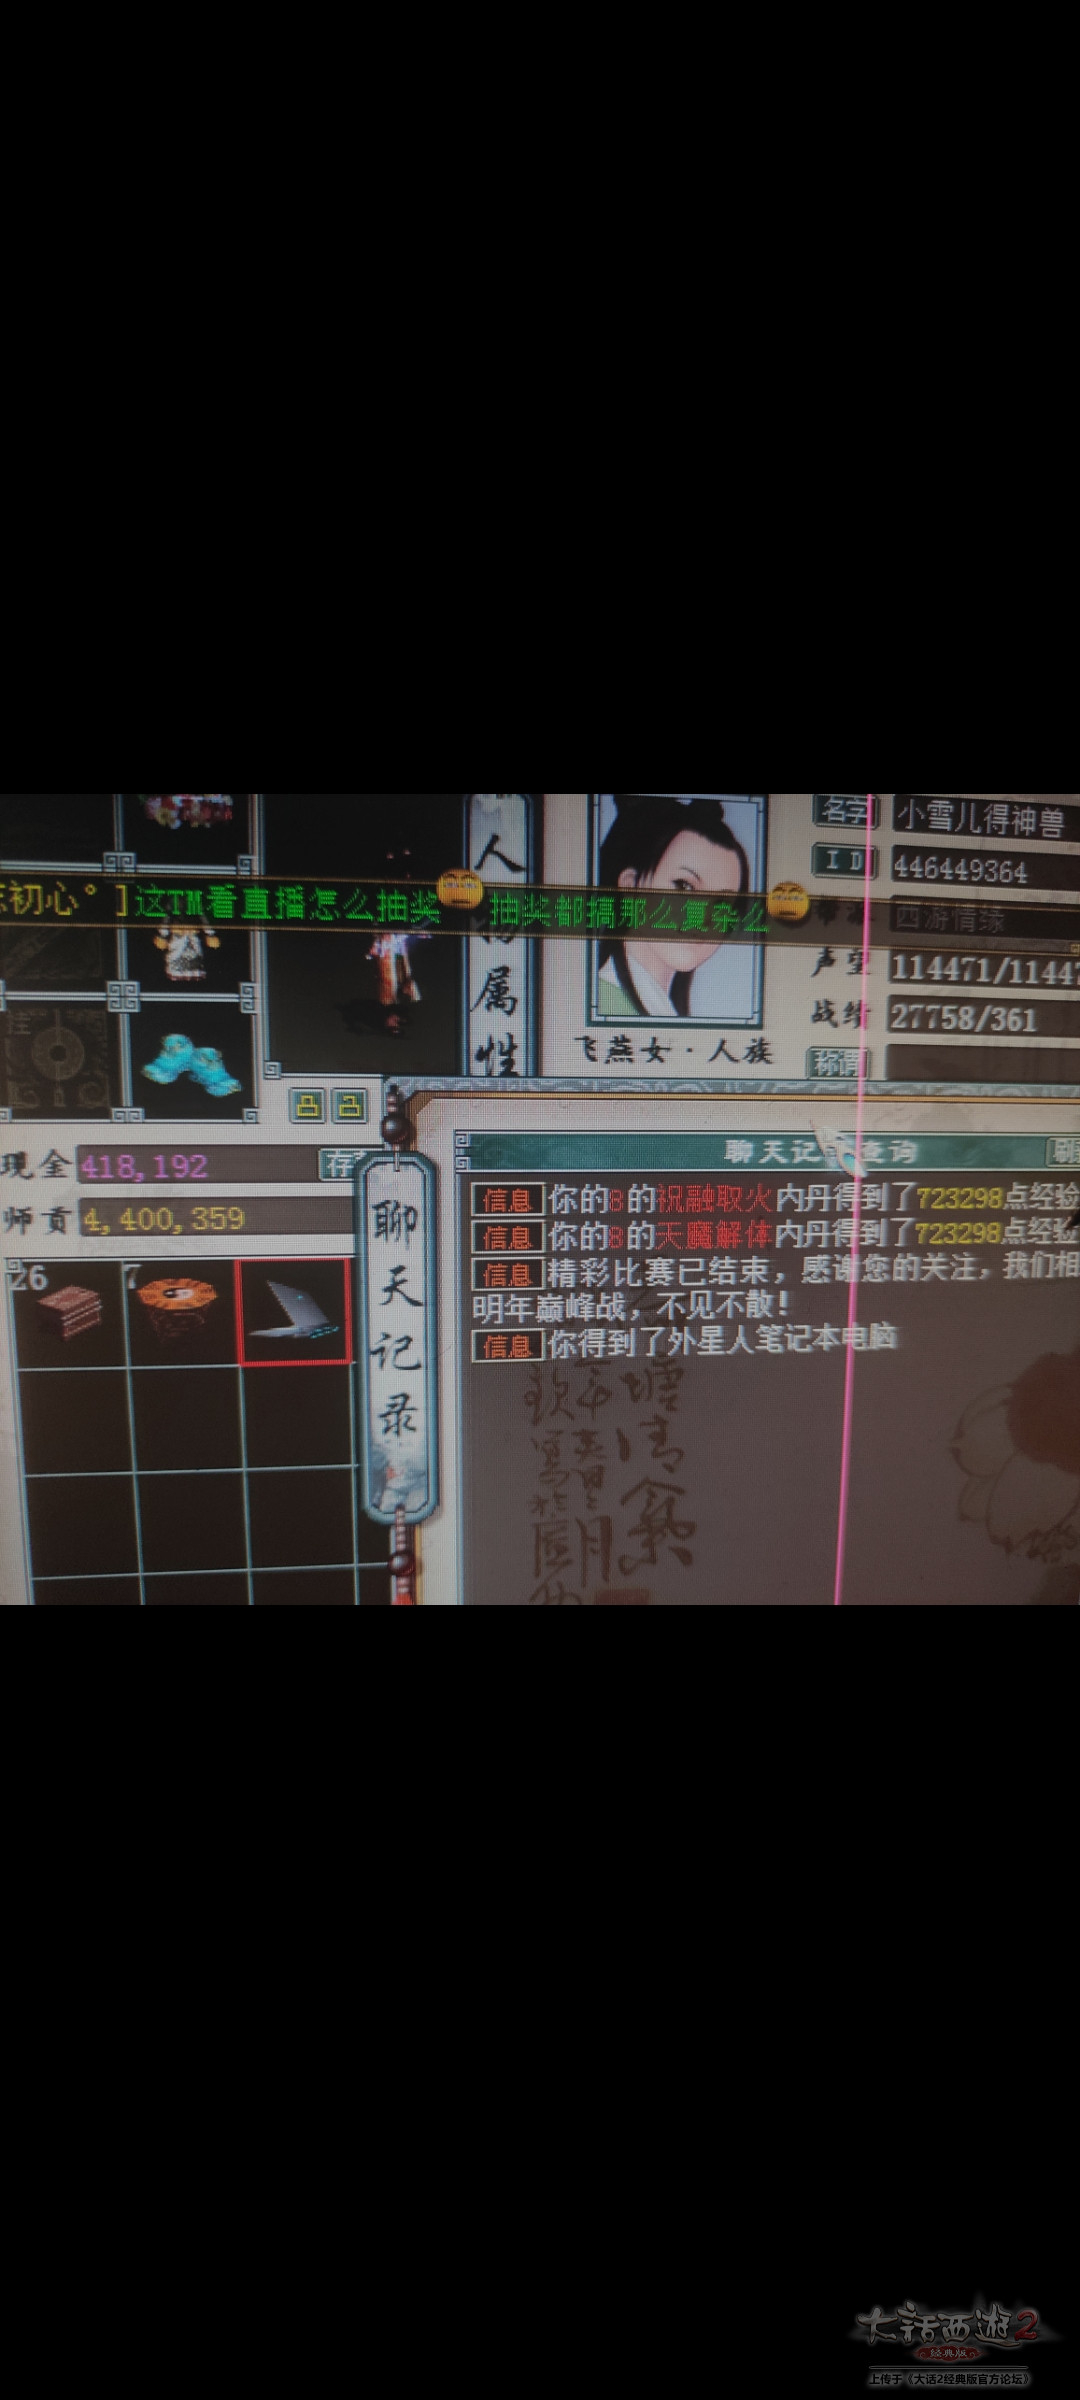 Screenshot_2021-08-01-01-38-53-354_com.miui.gallery.jpg